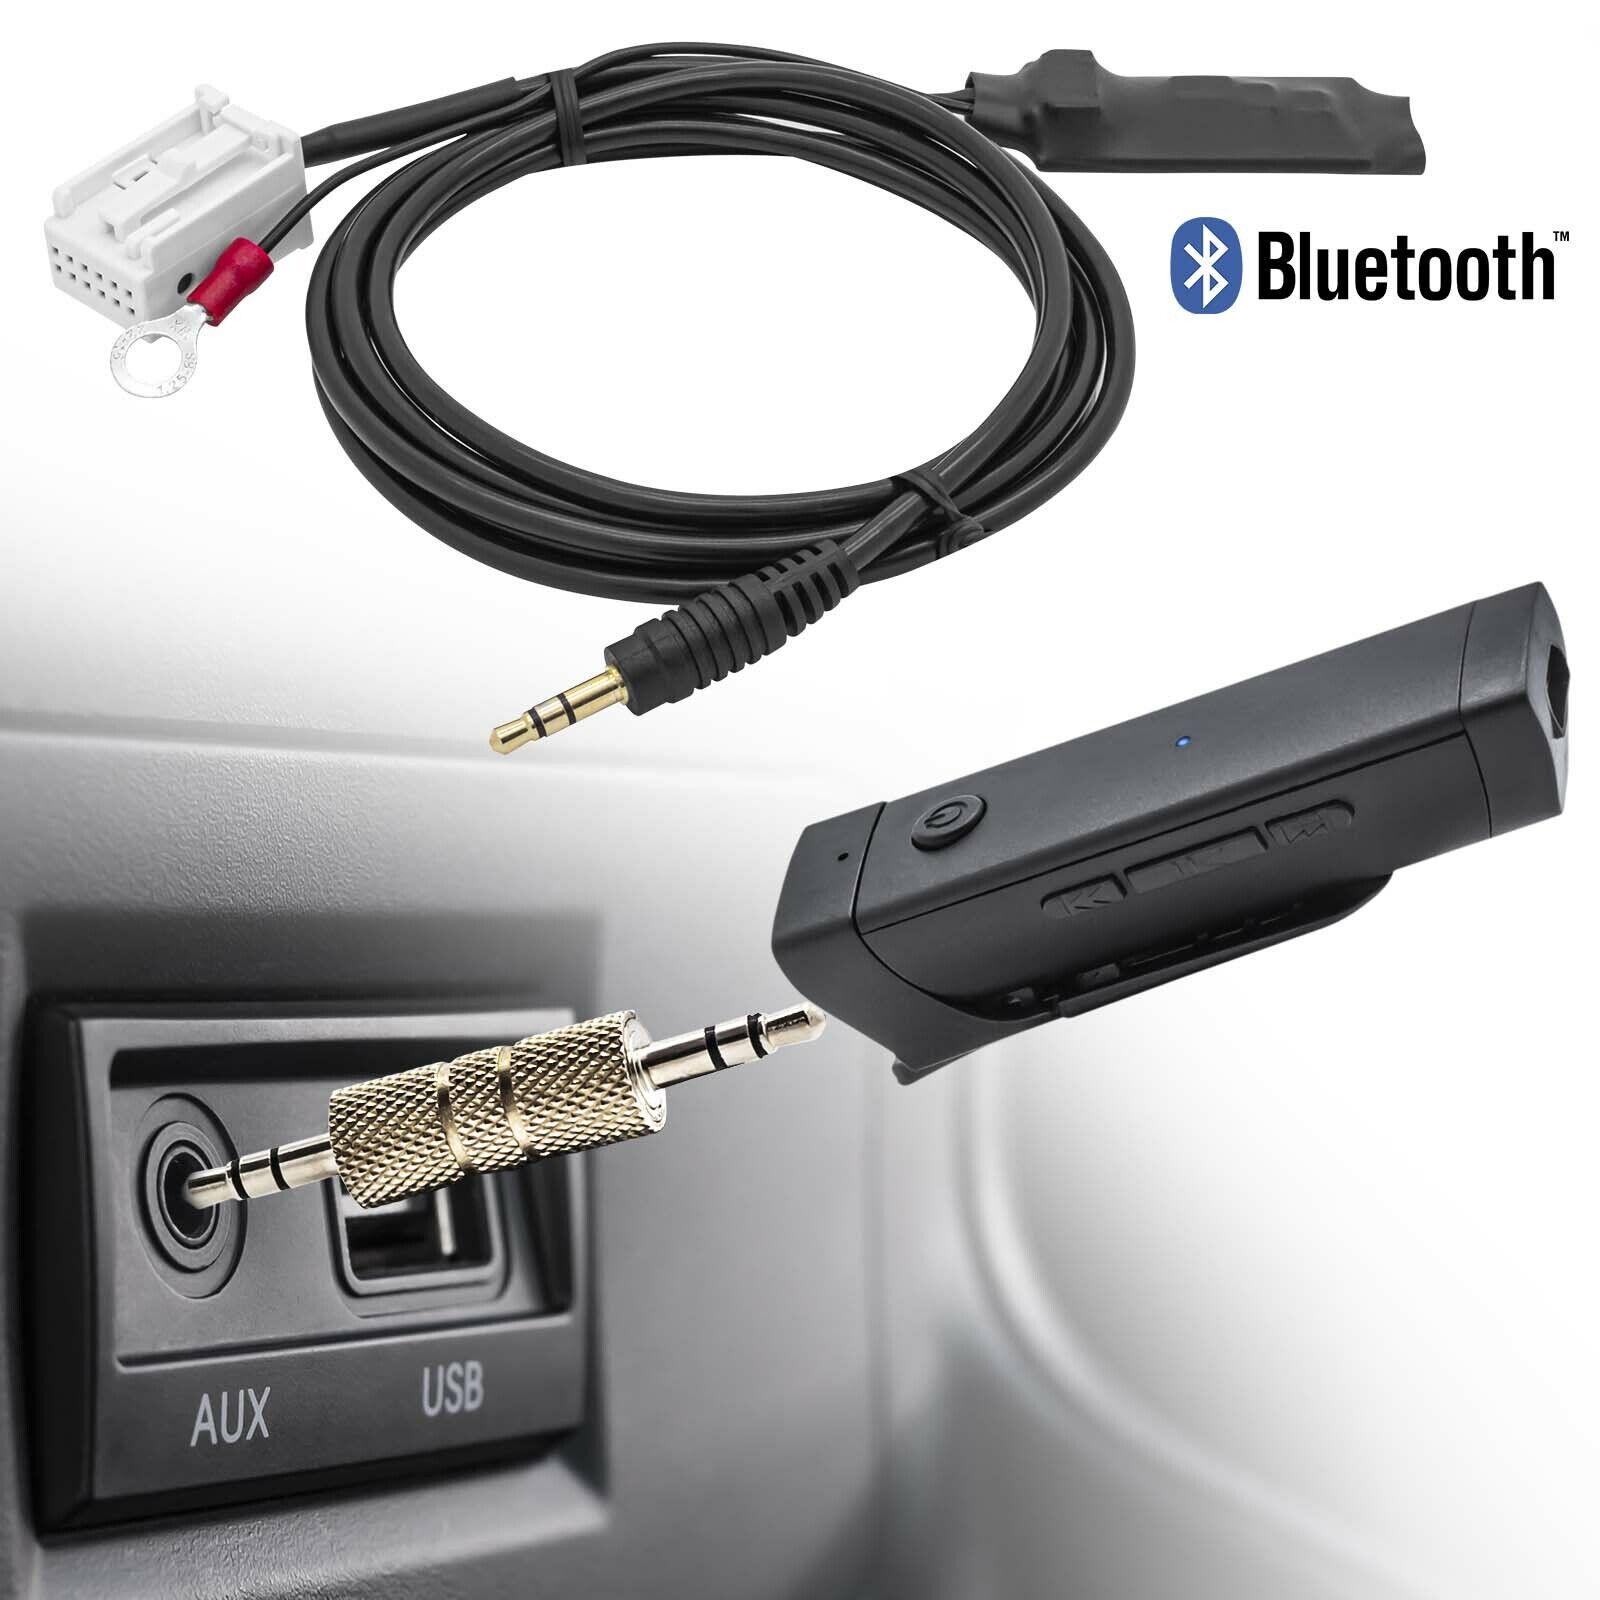 Bluetooth Plug and Play Kabel Columbus MFD 3 RNS RCD 310 510 Kabelbaum Stecker